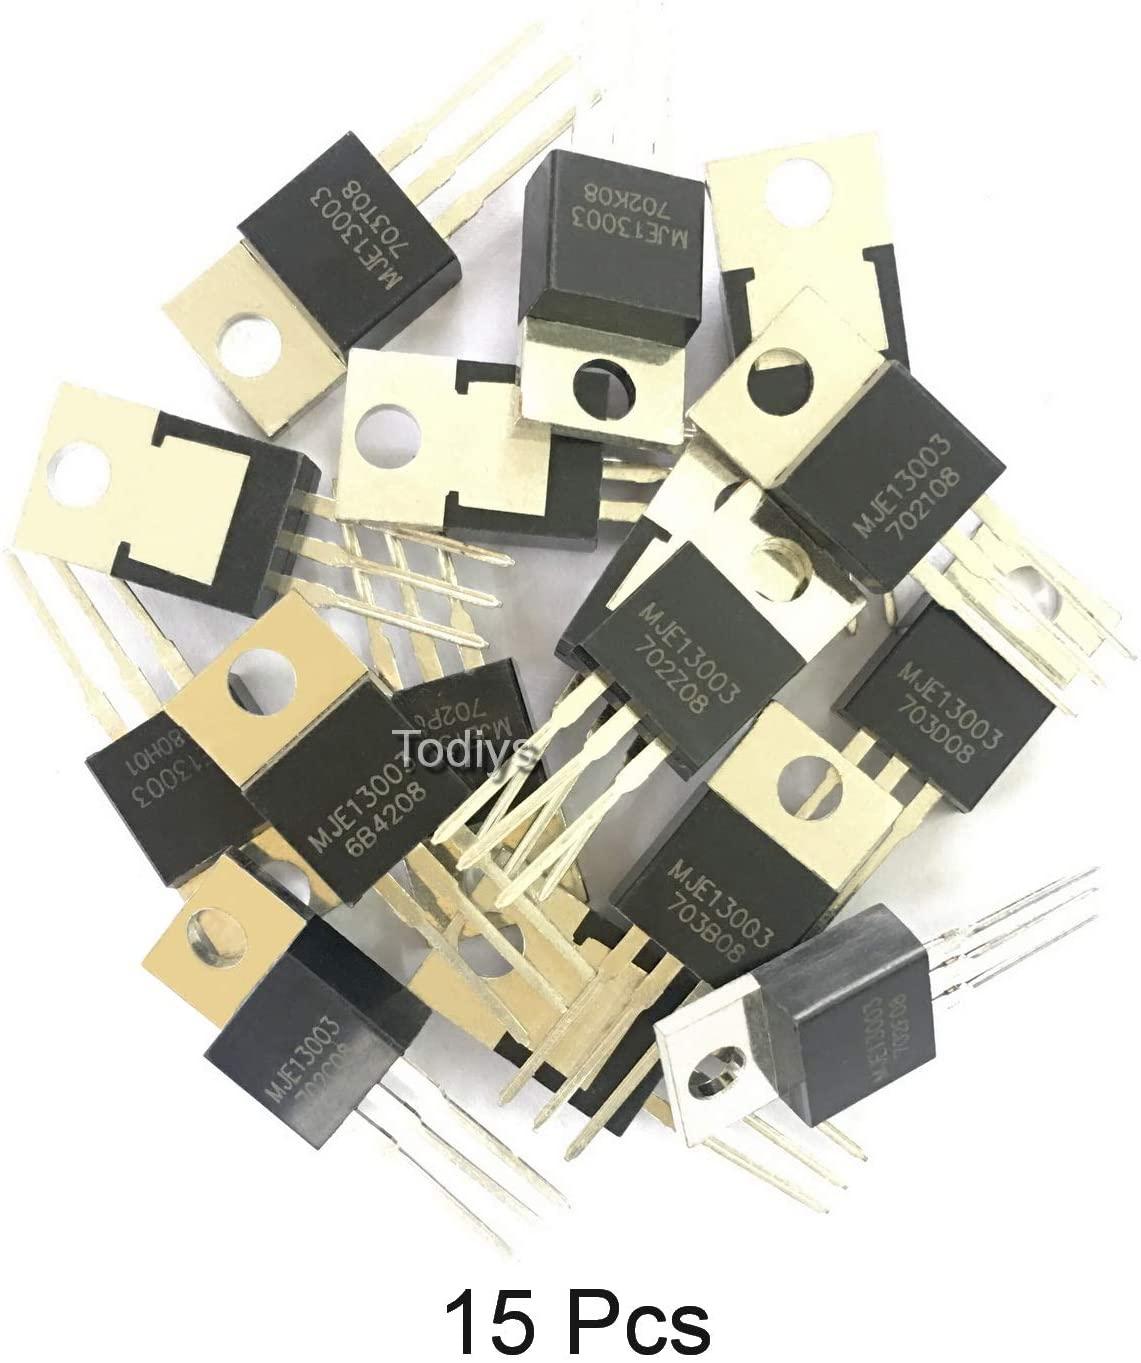 Todiys New 15Pcs for E13003 E13003-2 MJE13003-2 KSE13003-2 TO-220 NPN Silicon Transistor MJE13003